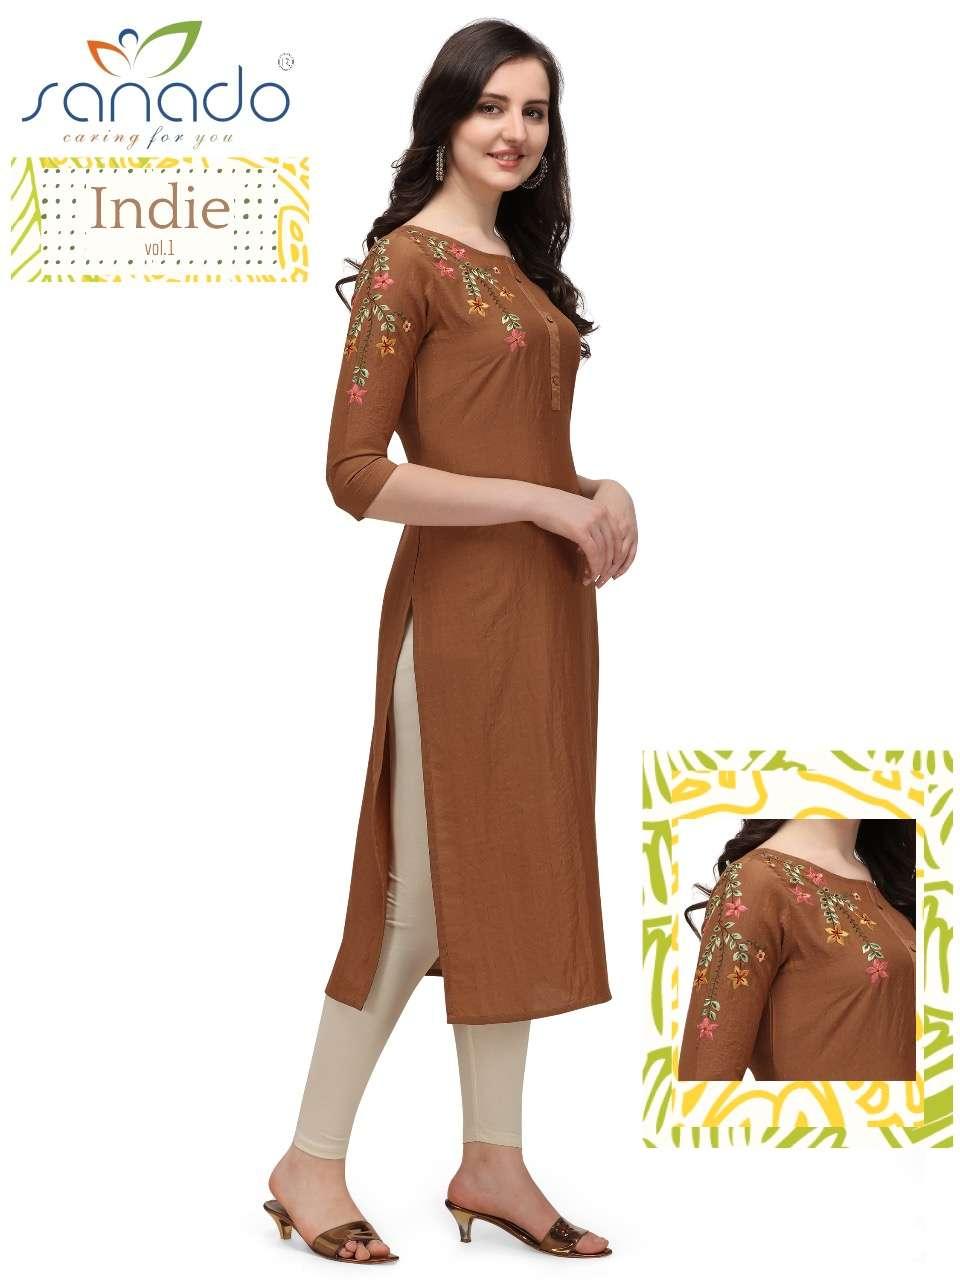 Sanado Indie chinon Butti Casual Kurtis collection